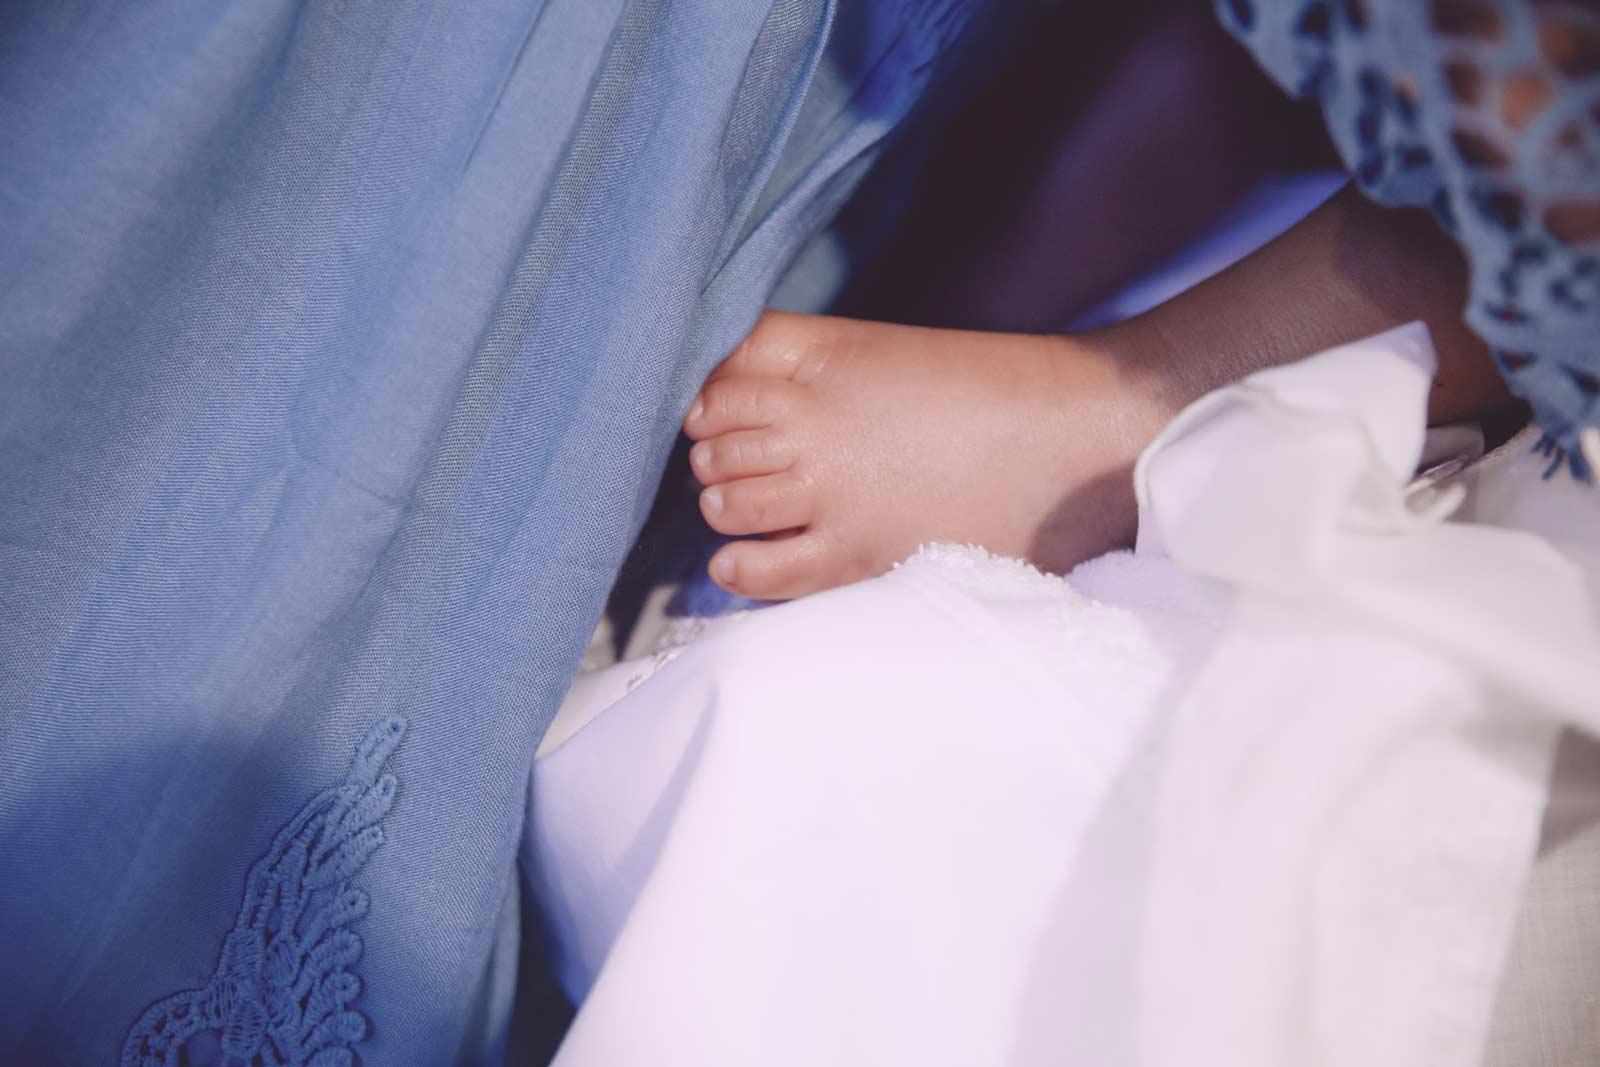 313 PhotoVaptisis βαπτιση βουλα αγιος νεκταριος vaptisi fotografos moro mama nona 016 PhotoVaptisis